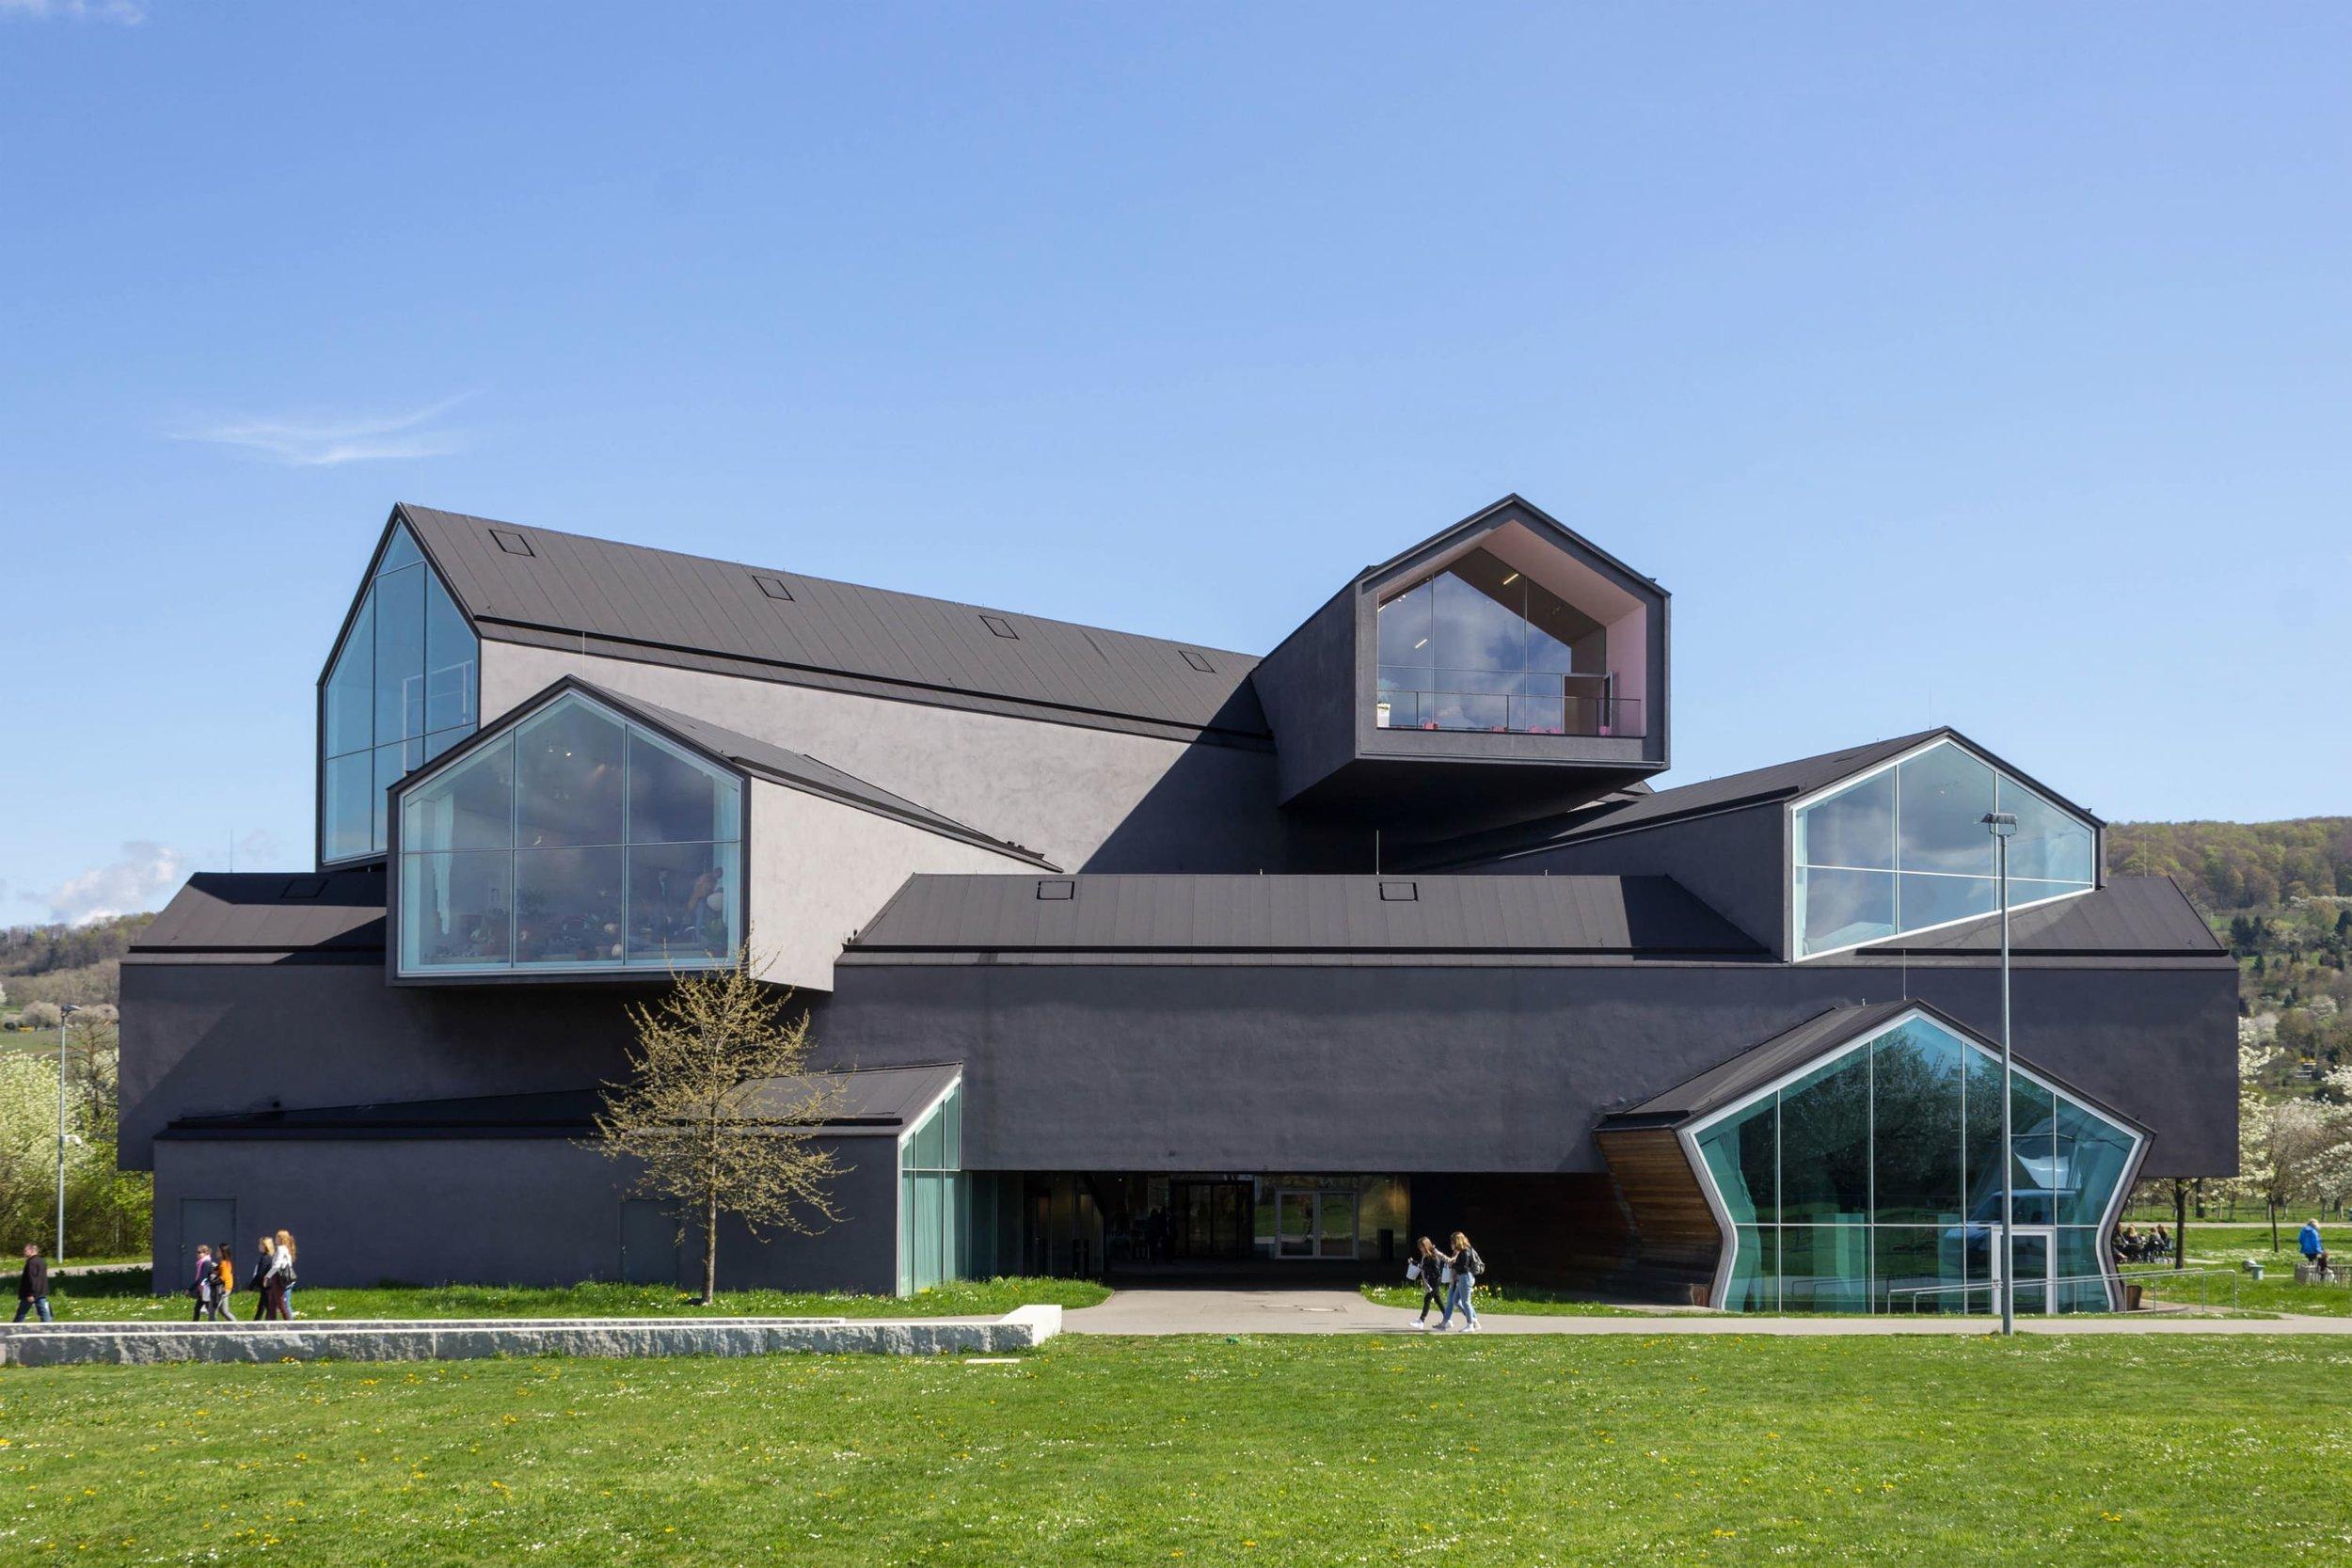 herzog-de-meuron-diego-laurino-vitrahaus-vitra-campus.jpeg